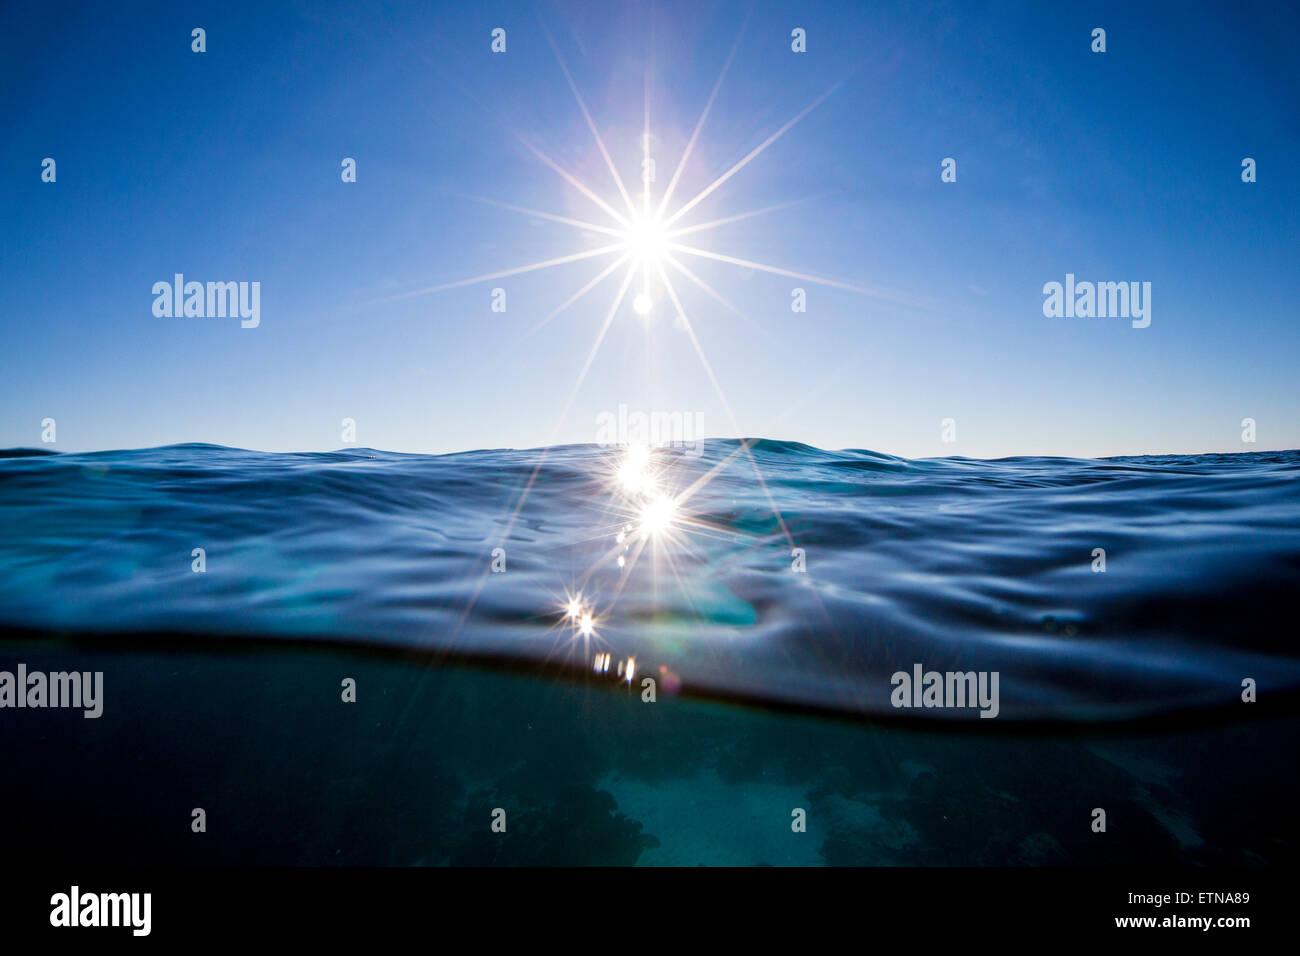 Sun shining over the ocean, Queensland, Australia - Stock Image